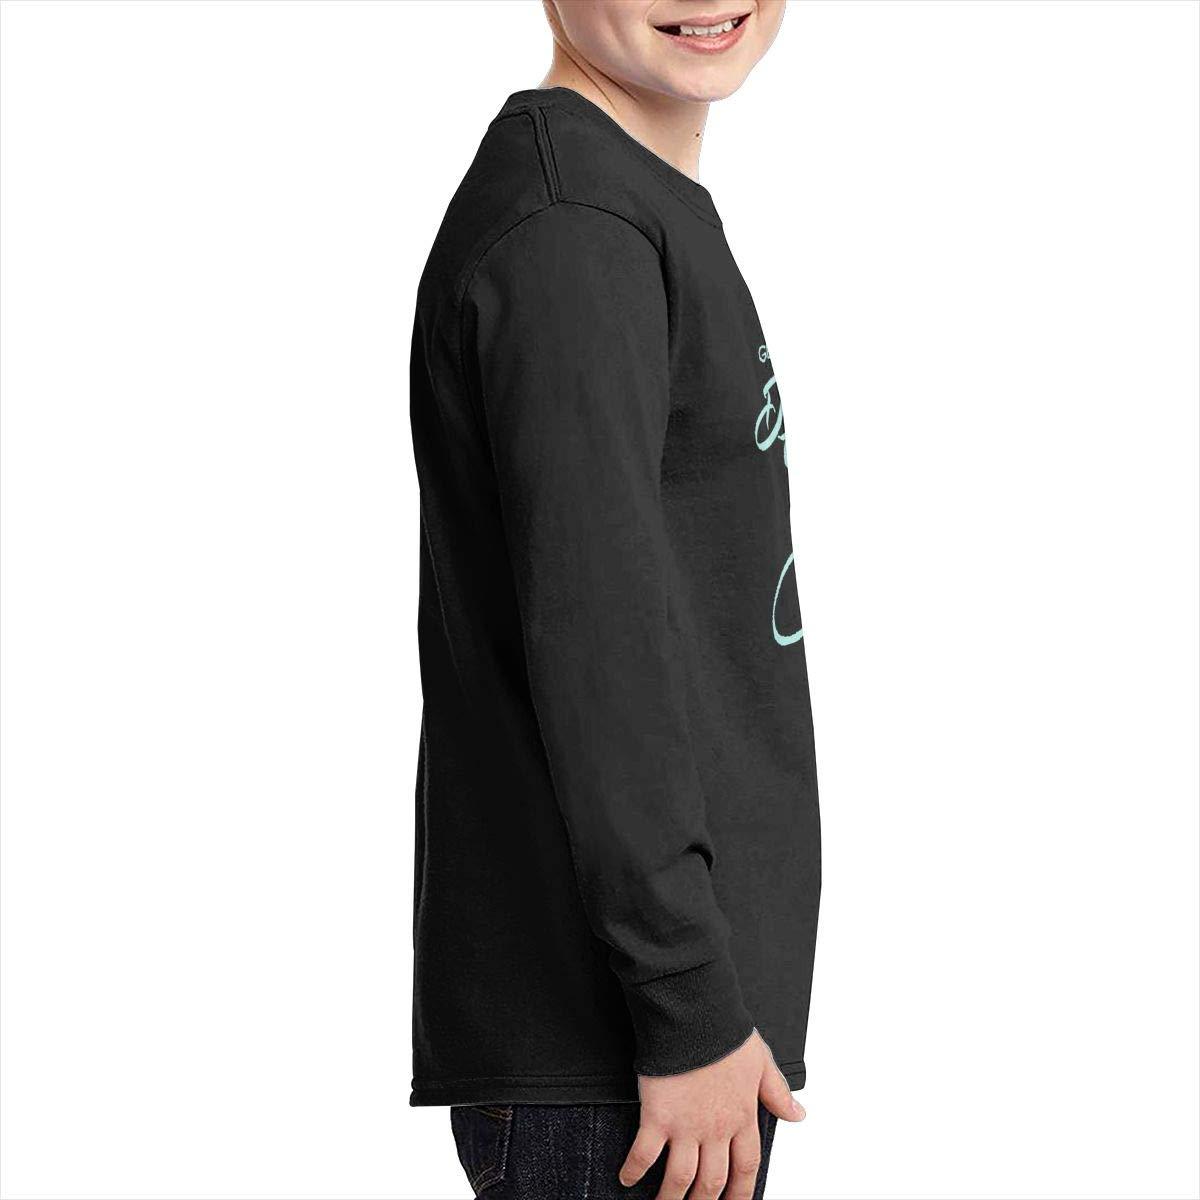 Optumus Draxx Them Sklounst Kids Sweatshirts Long Sleeve T Shirt Boy Girl Children Teenagers Unisex Tee